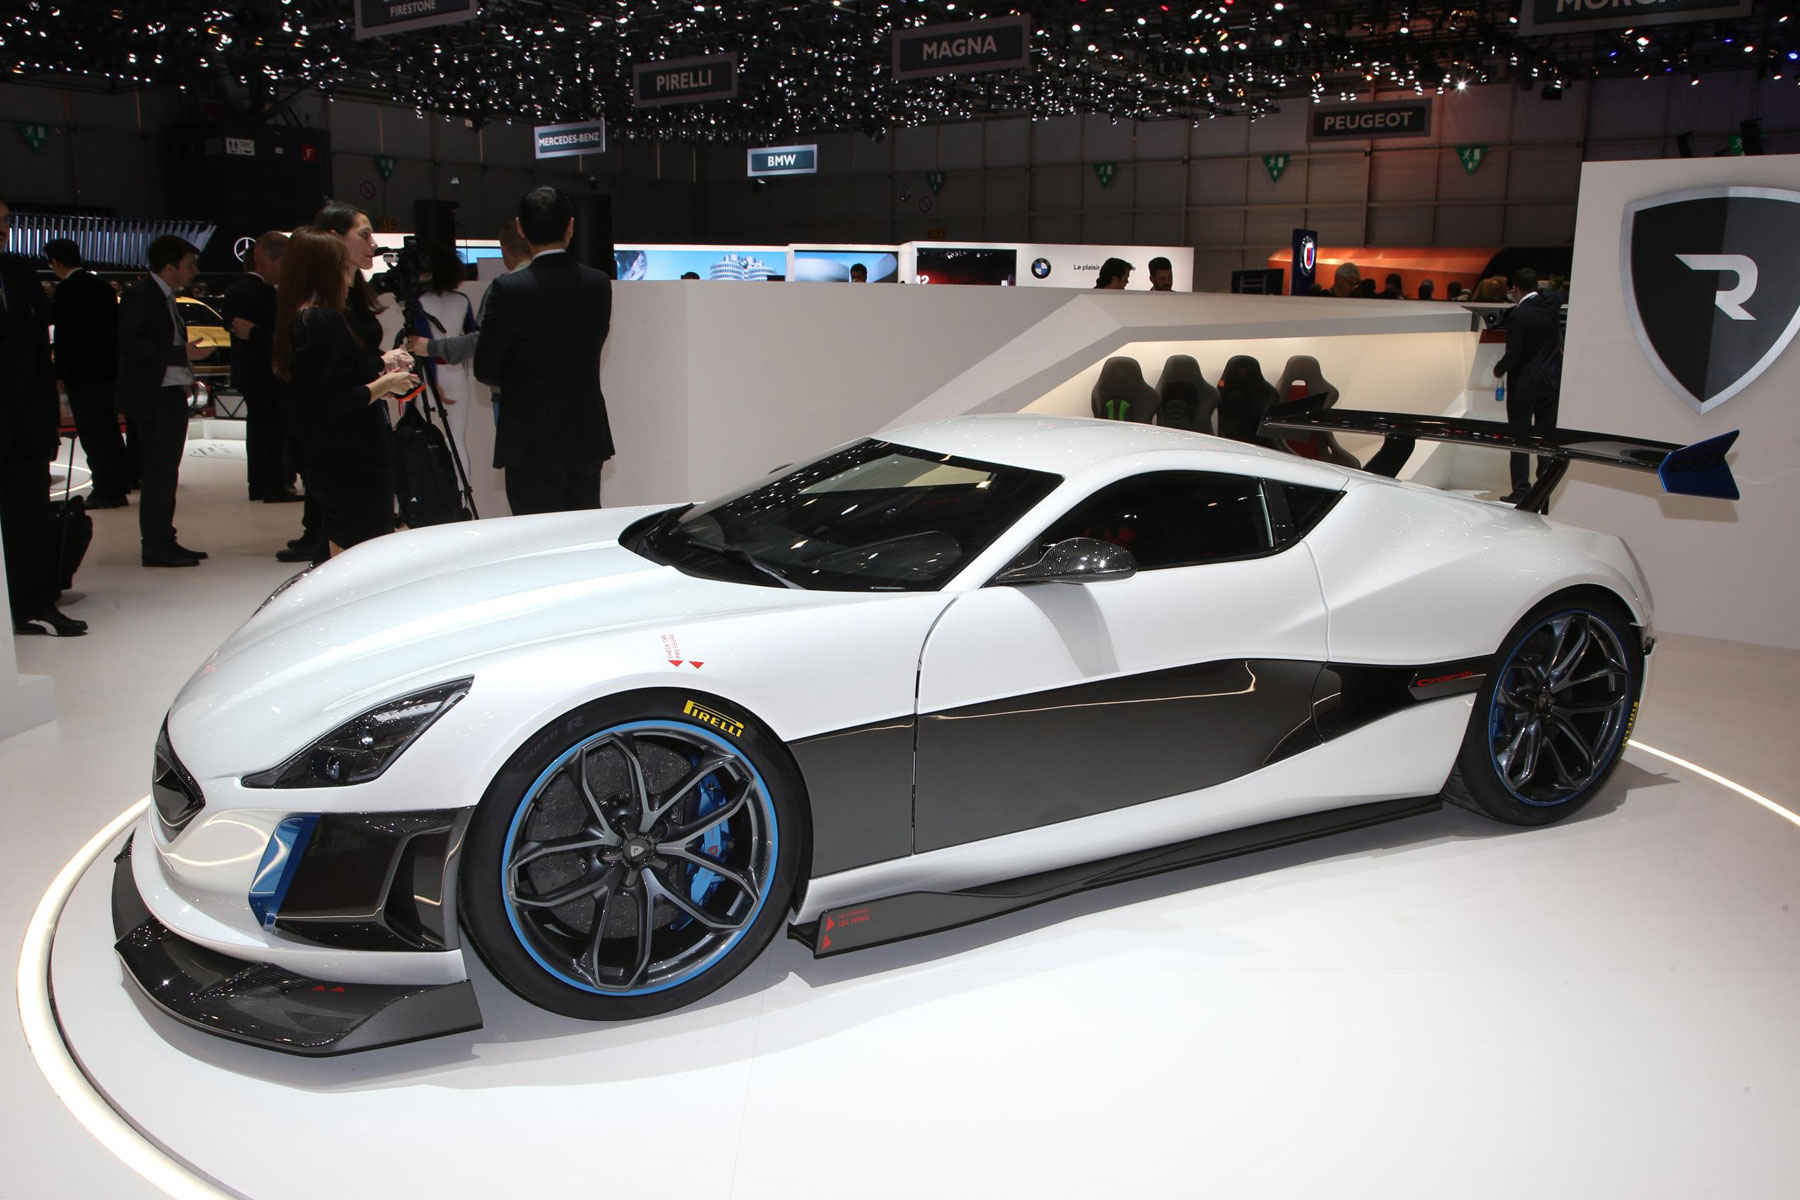 Rimac Concept One – 2.5 seconds